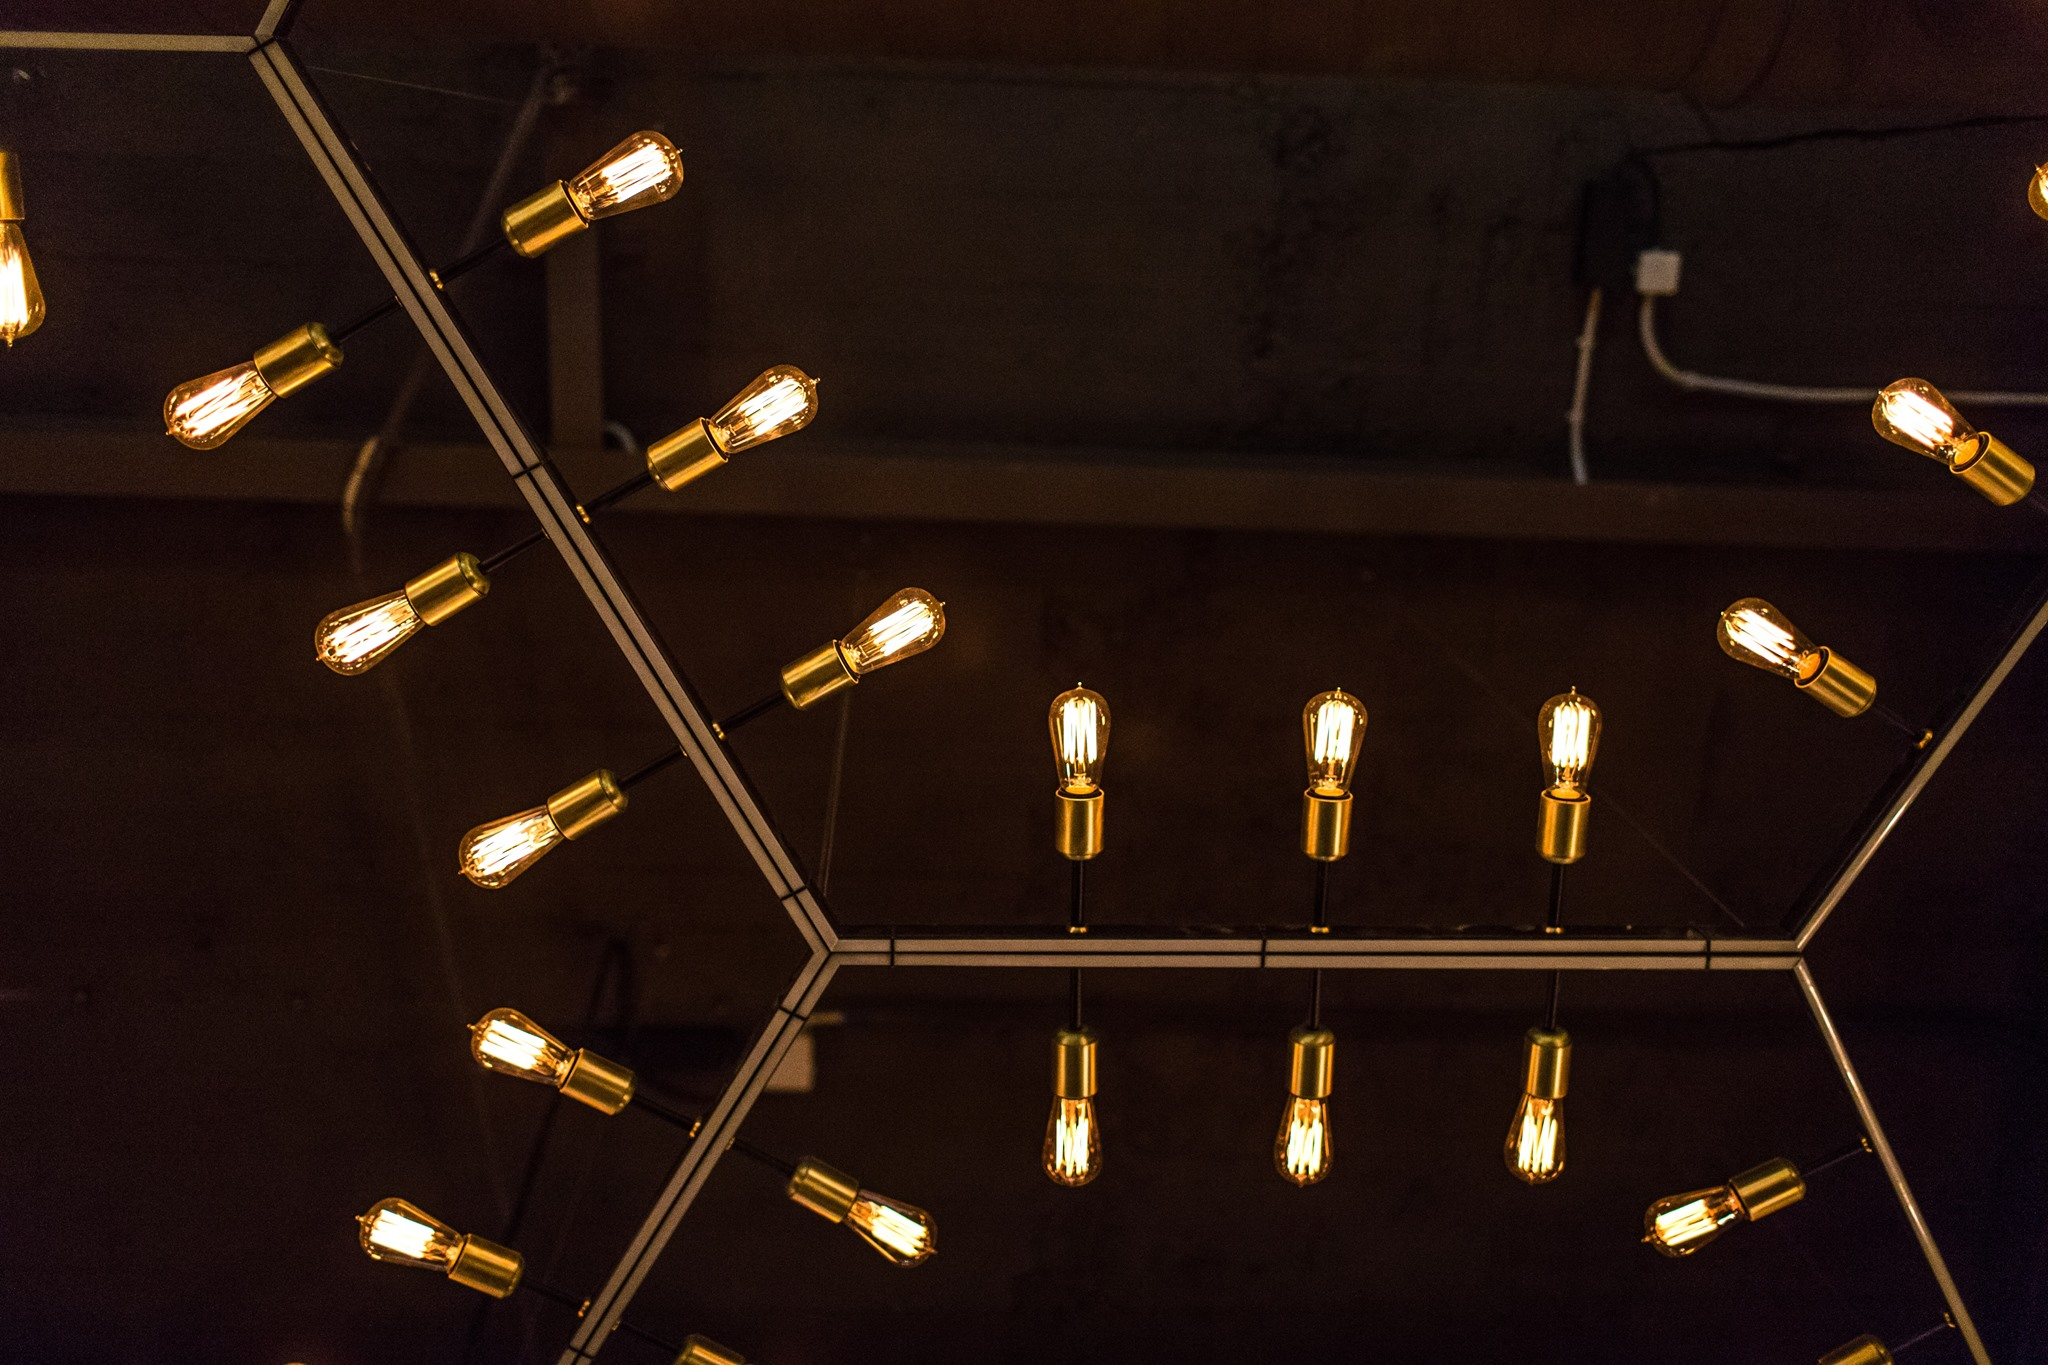 shestigranniy svetodiodniy svetilnik